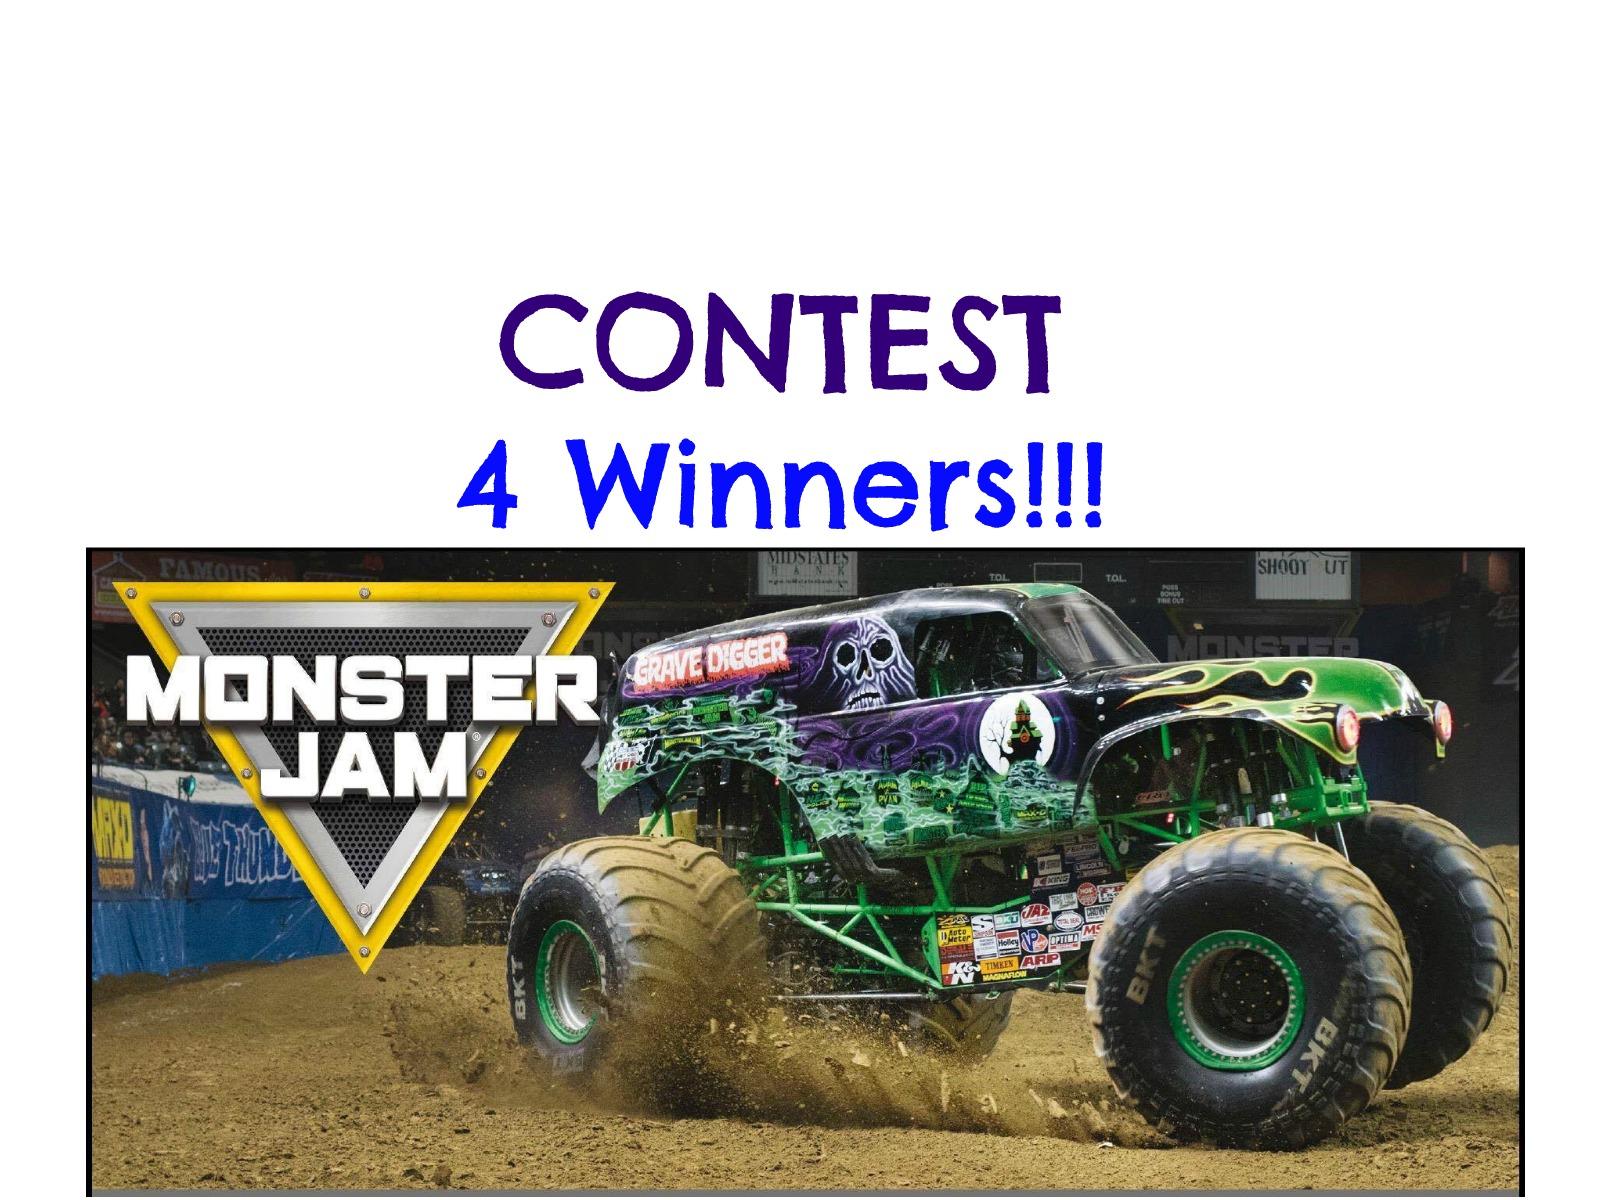 Monster Jam Contest-4 Winners